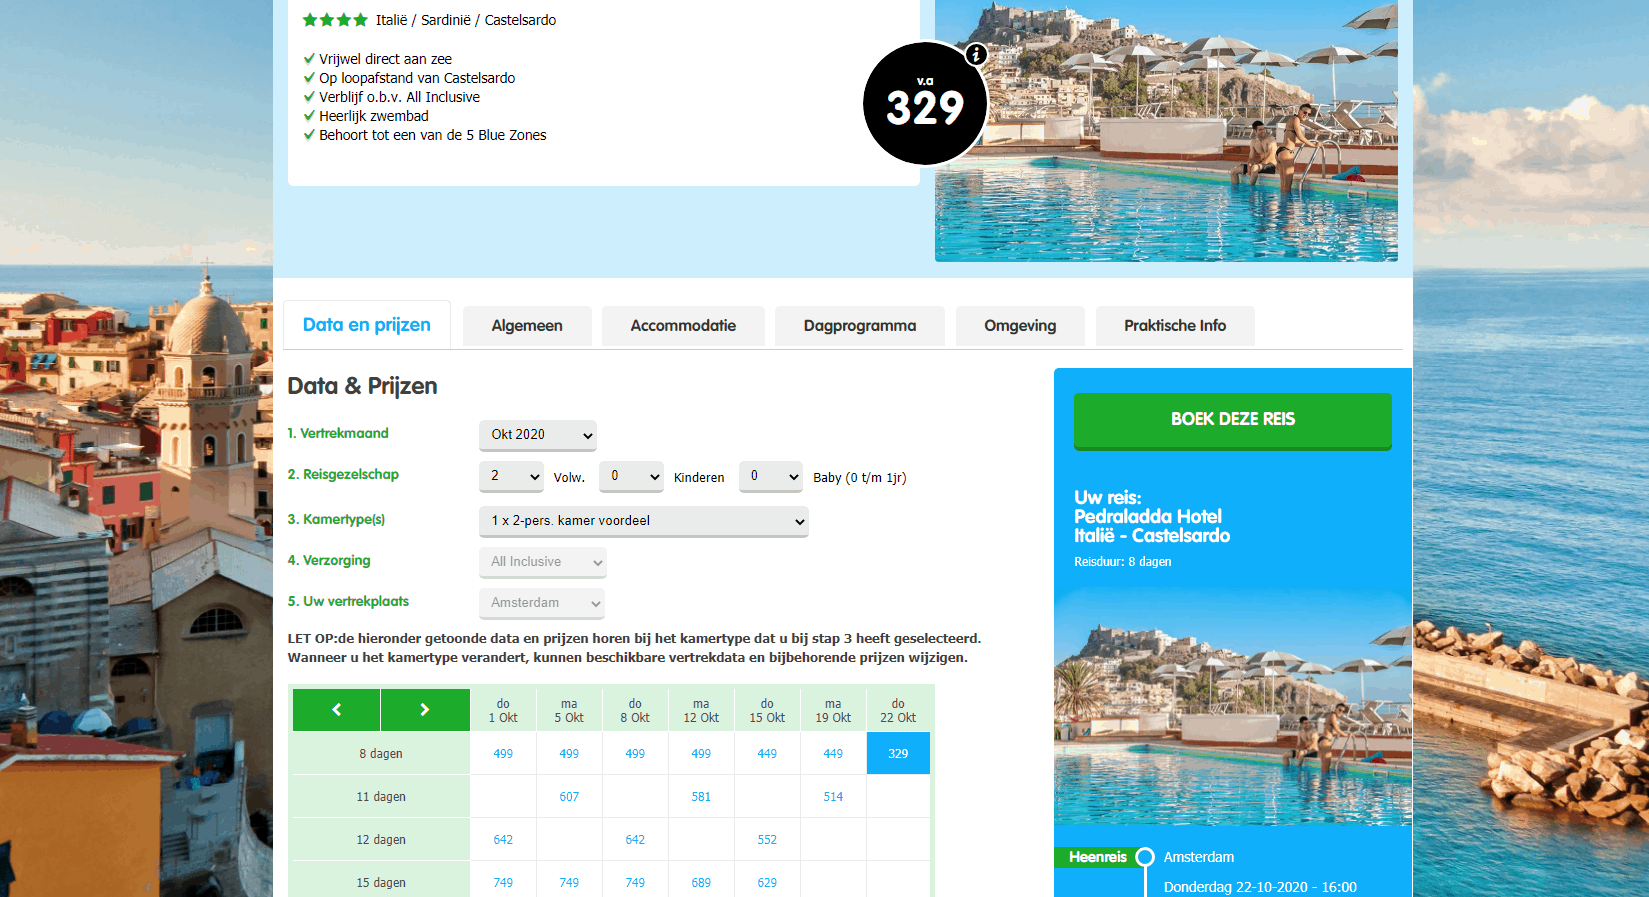 aanbiedingen goedkoopste all inclusive vliegvakanties Sardinië 2020 2 Aanbiedingen goedkope 8 daagse All Inclusive vliegvakanties Sardinië, ****Hotels, vanaf € 329.